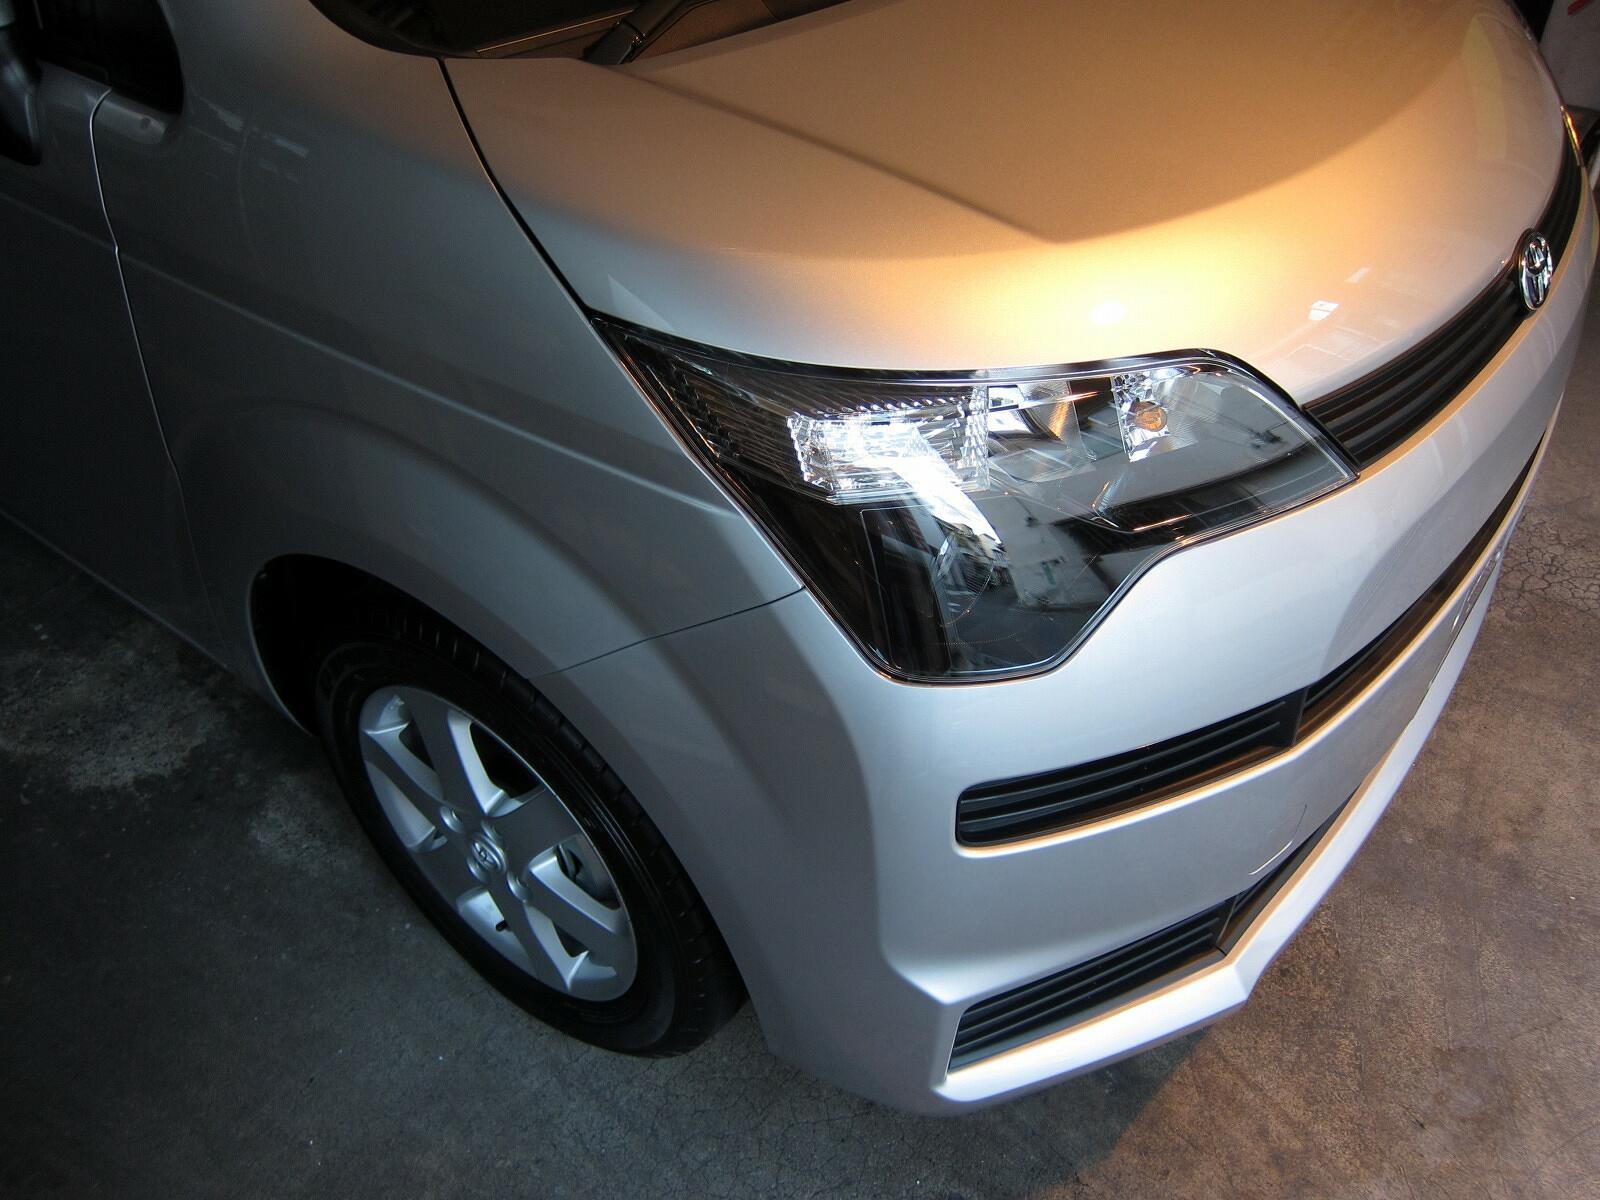 20121128-toyota-spade-05